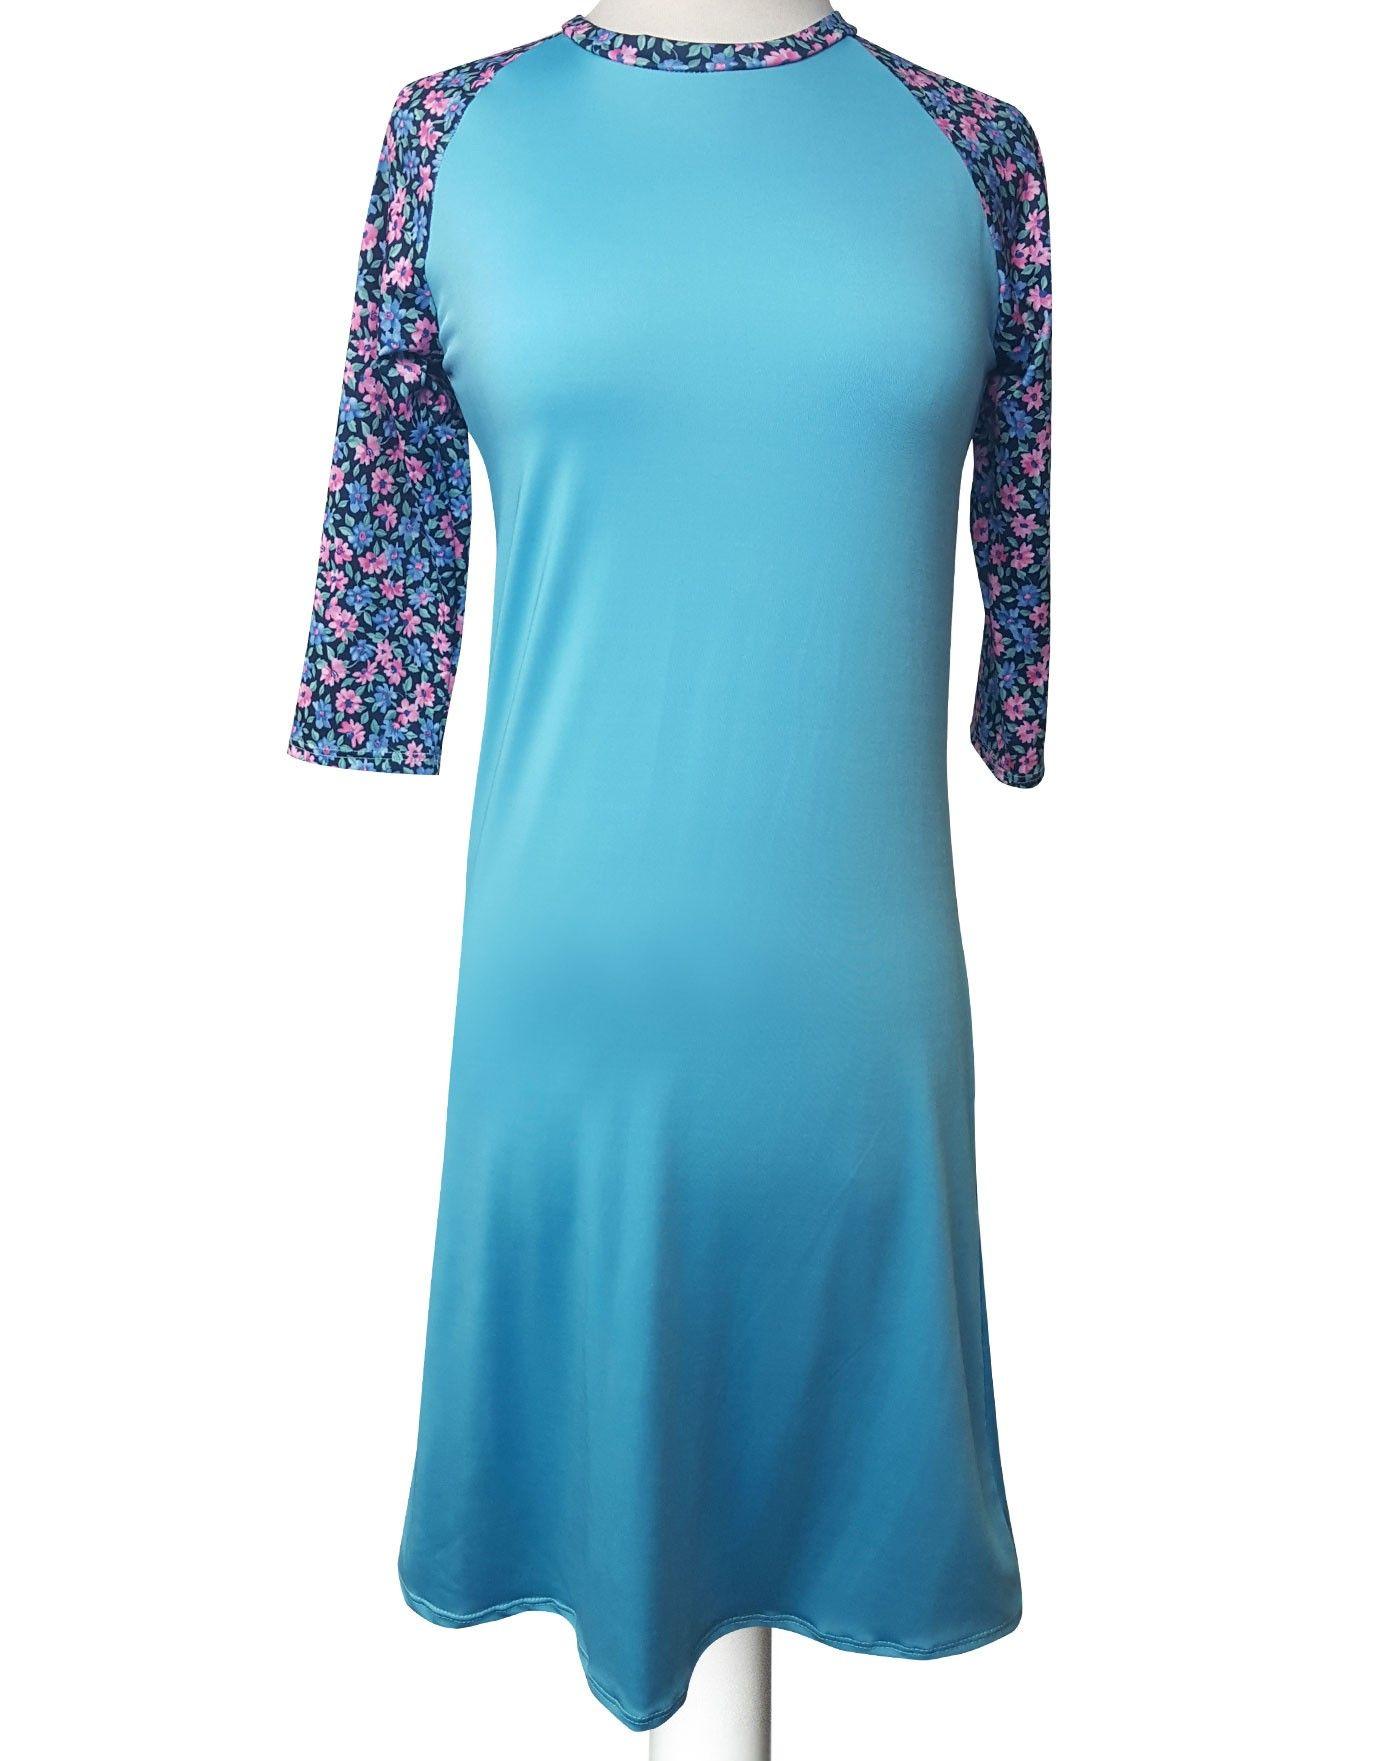 0fdef70654a $15 Coverup - Summer | modest (tznius) swimwear | Summer dresses ...